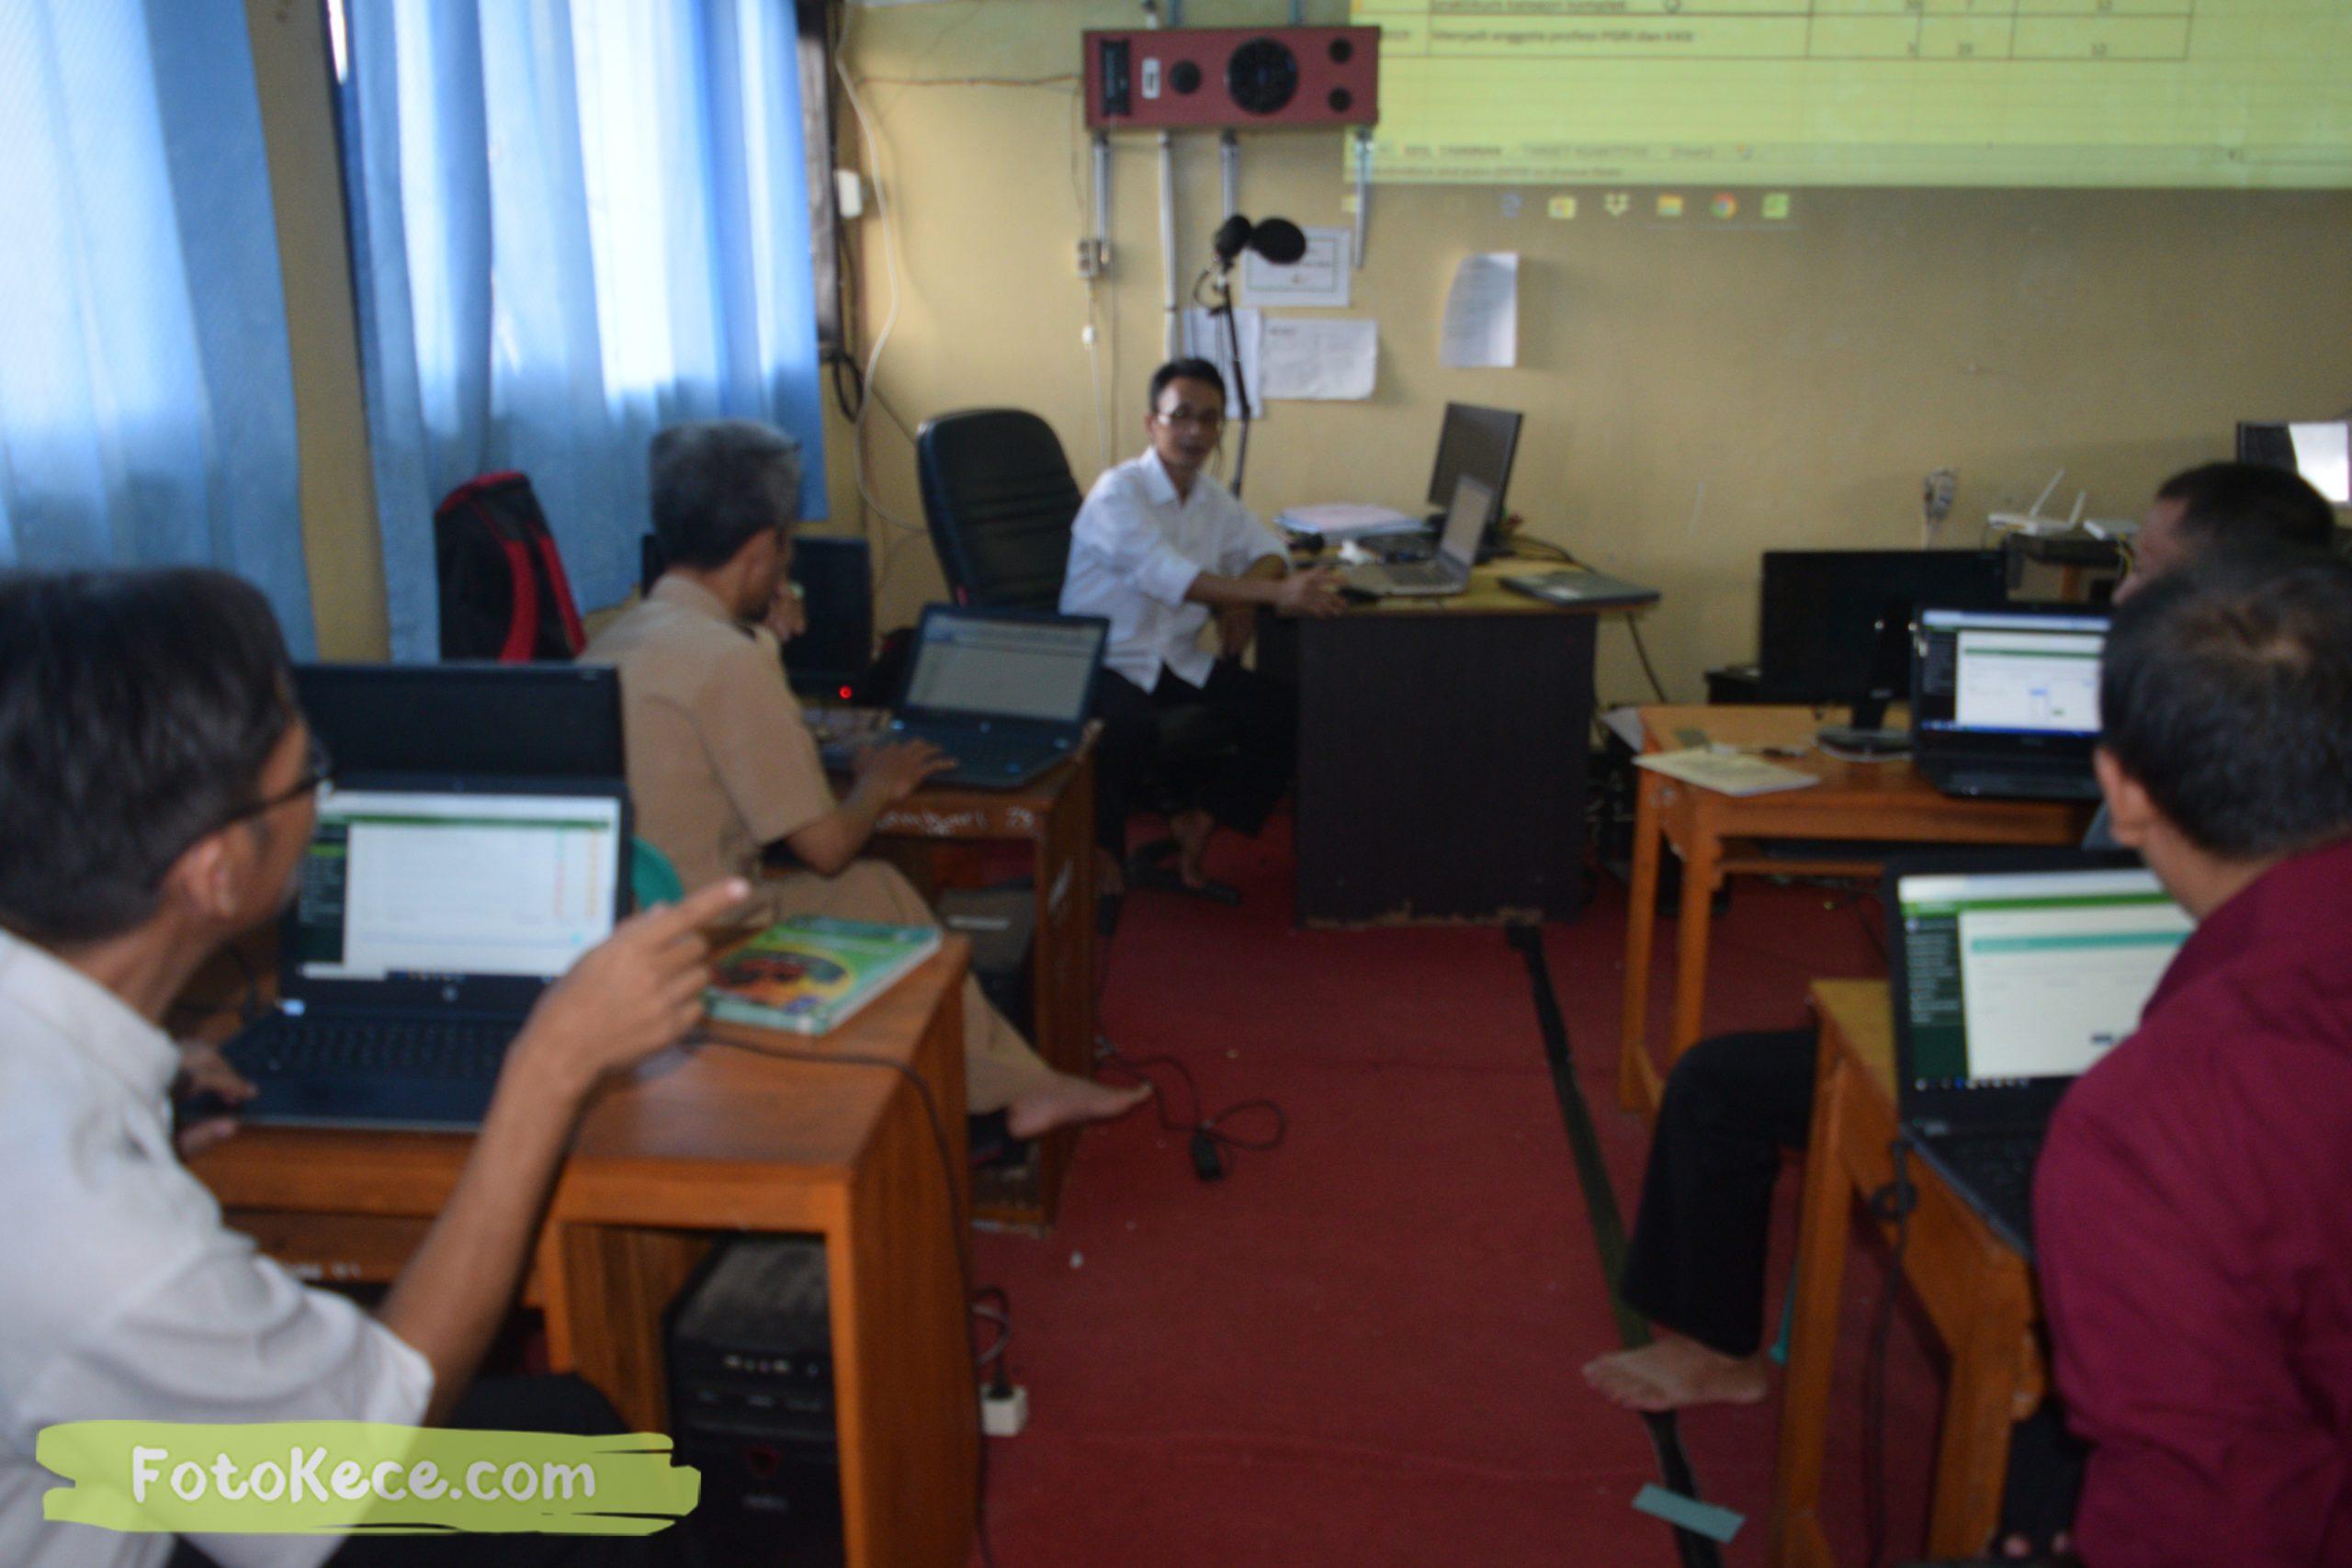 bimbingan teknis sieka 2020 bersama Bpk Abdul Aziz 08012020 fotokece 26 scaled